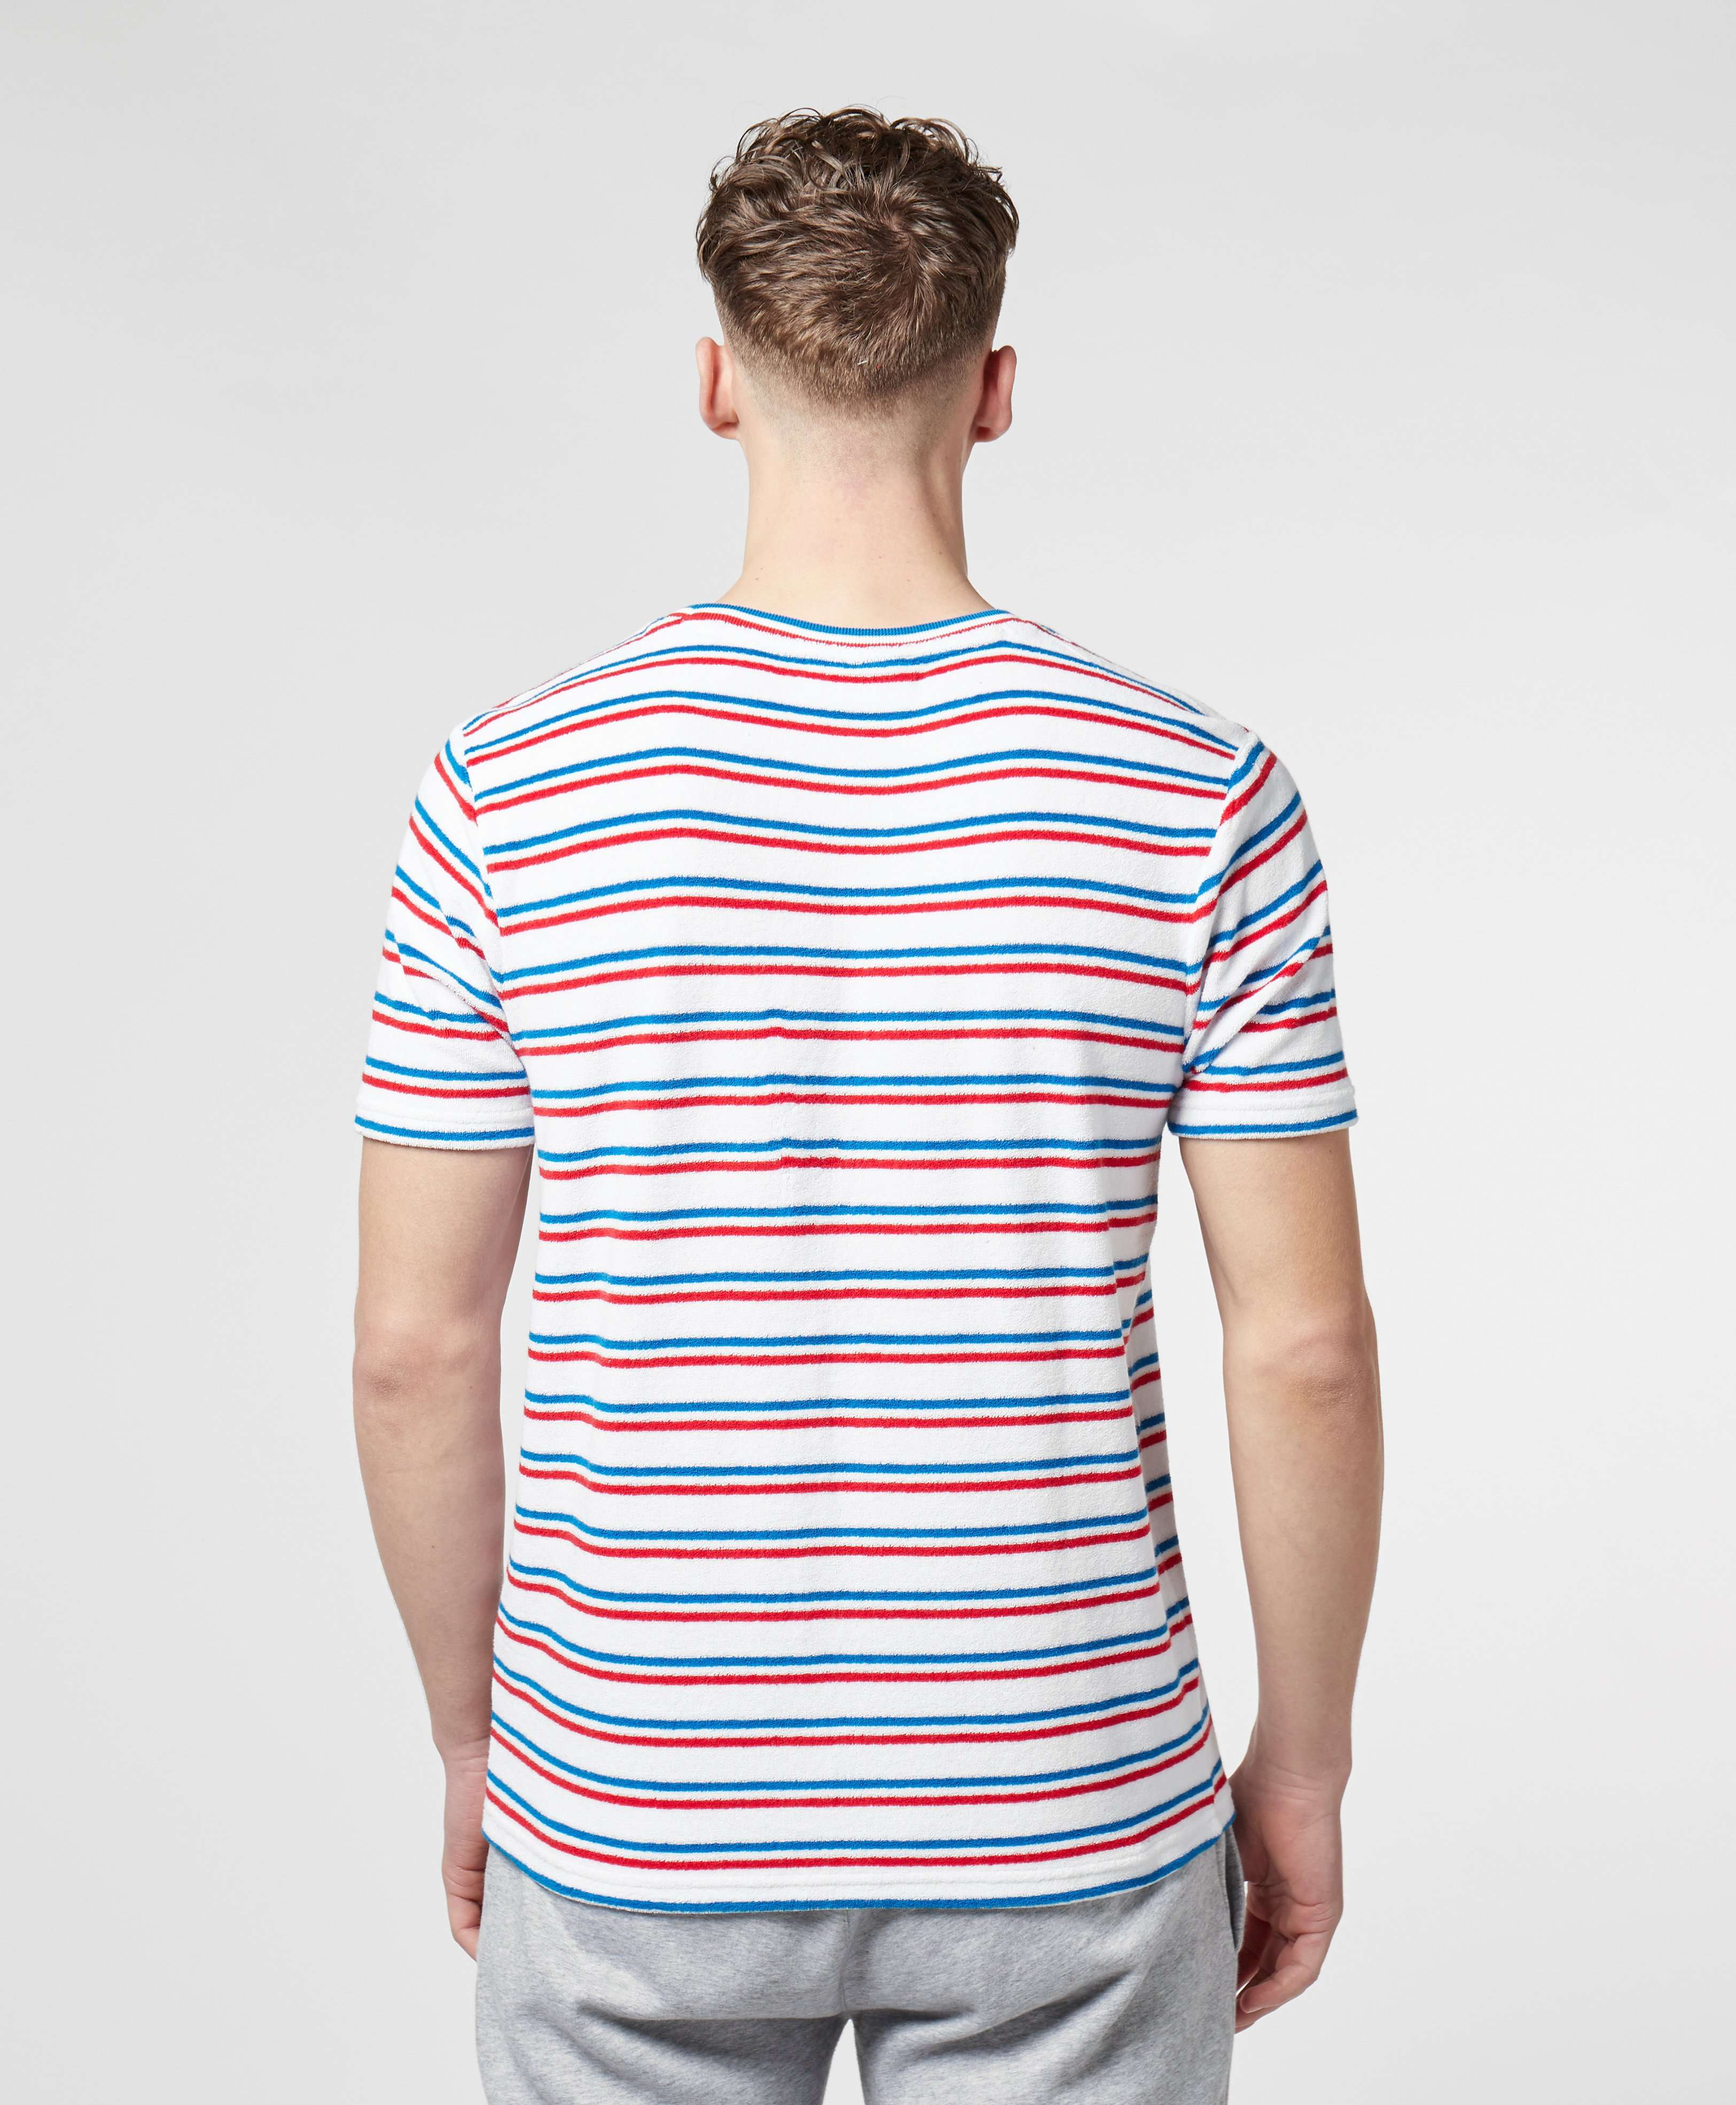 Fila Terry Stripe Short Sleeve T-Shirt